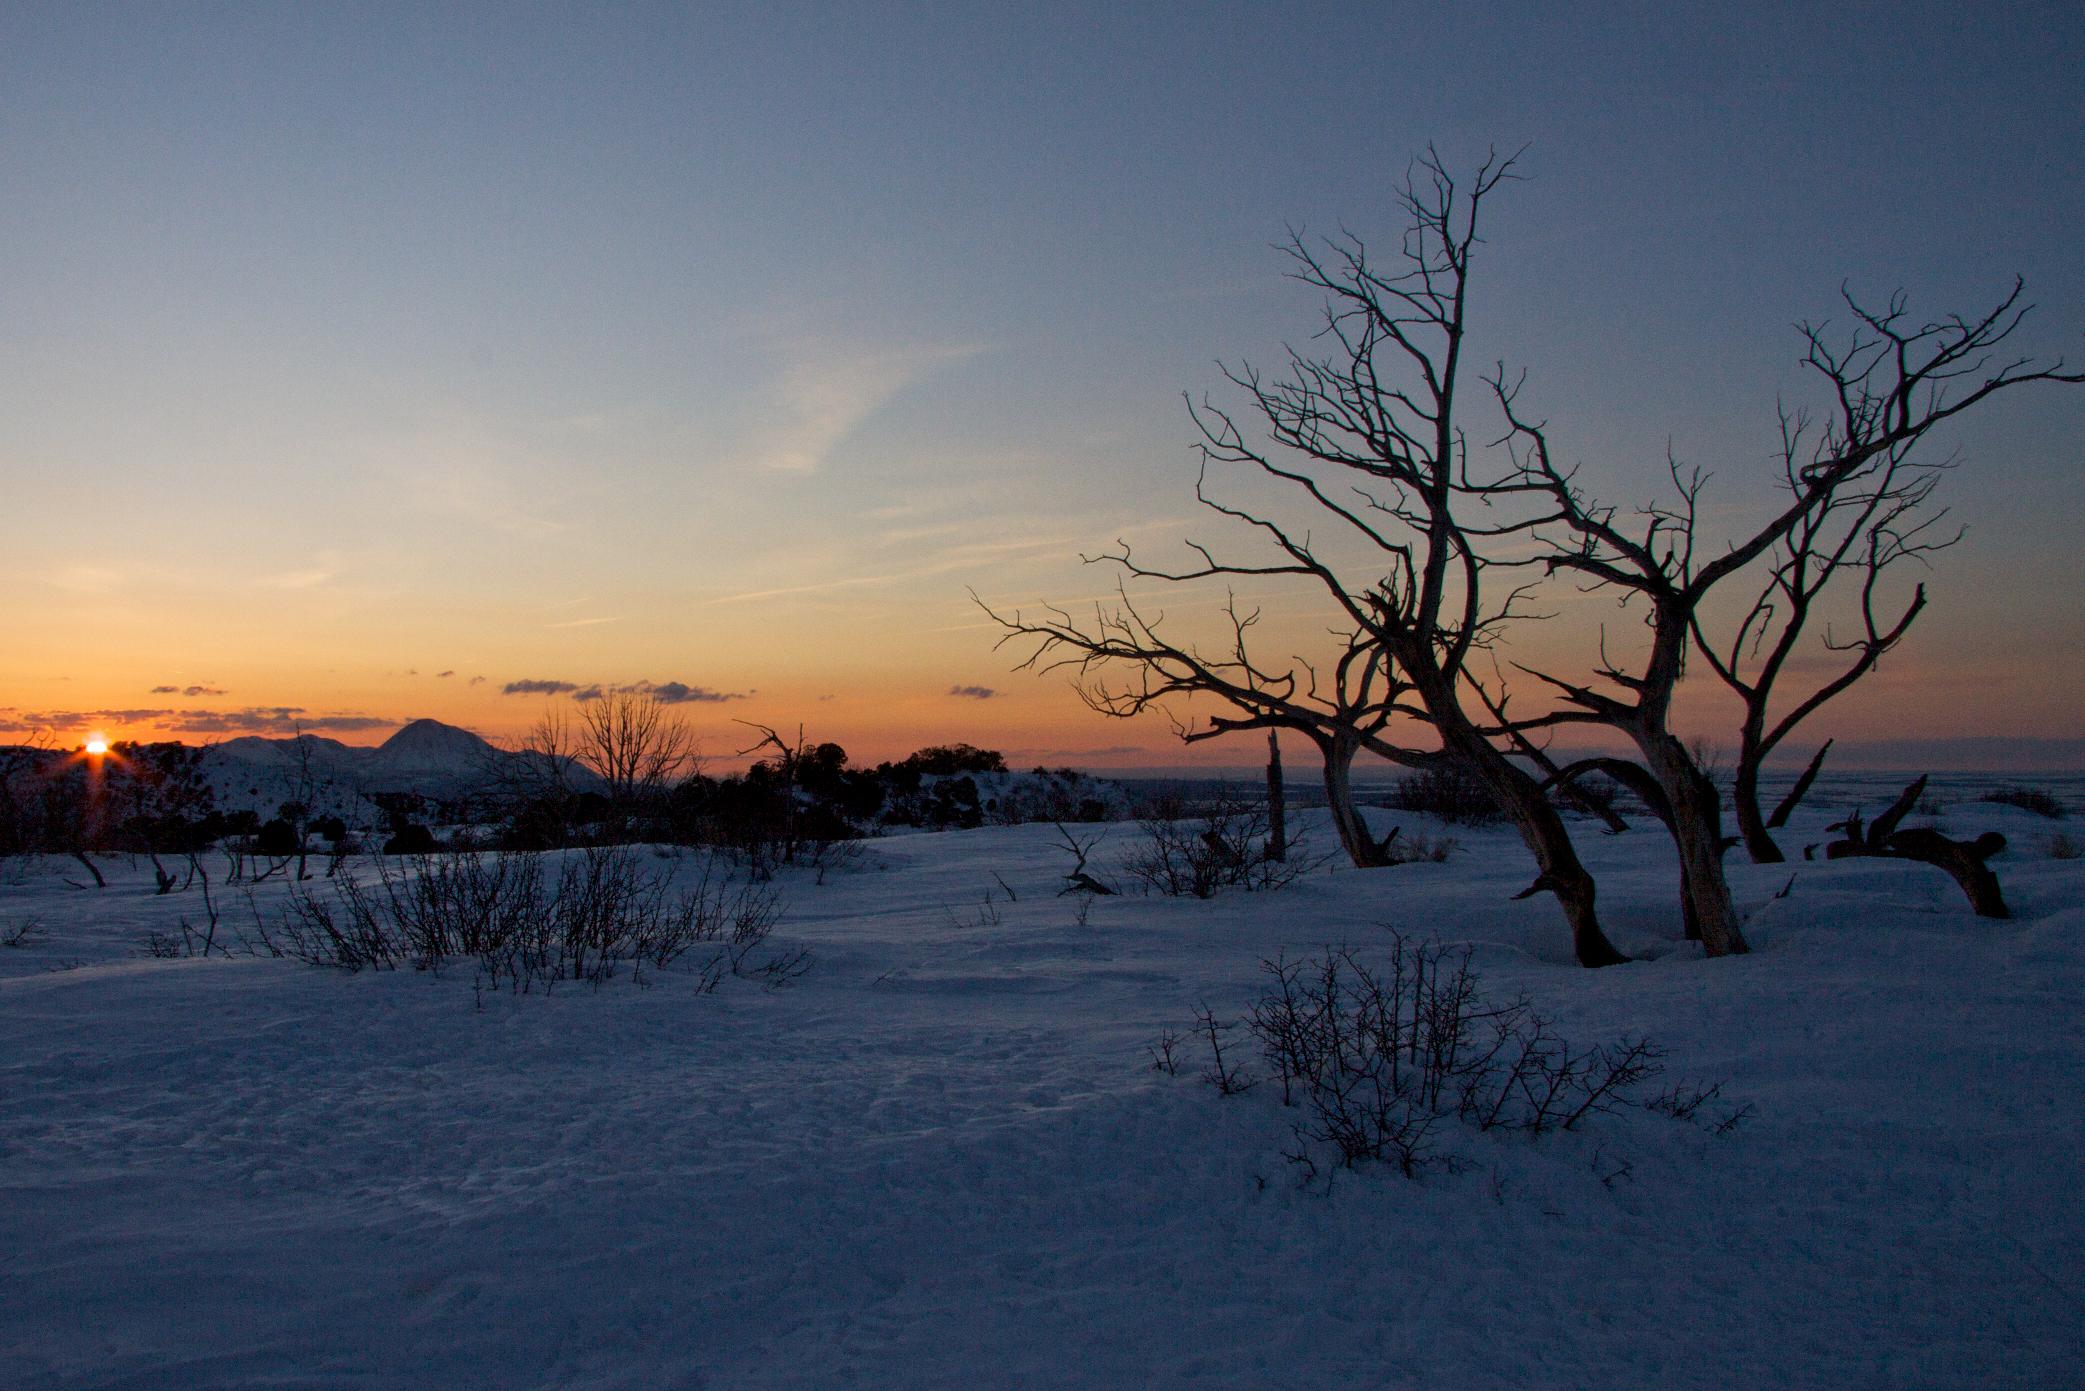 Sleeping Ute Sunset